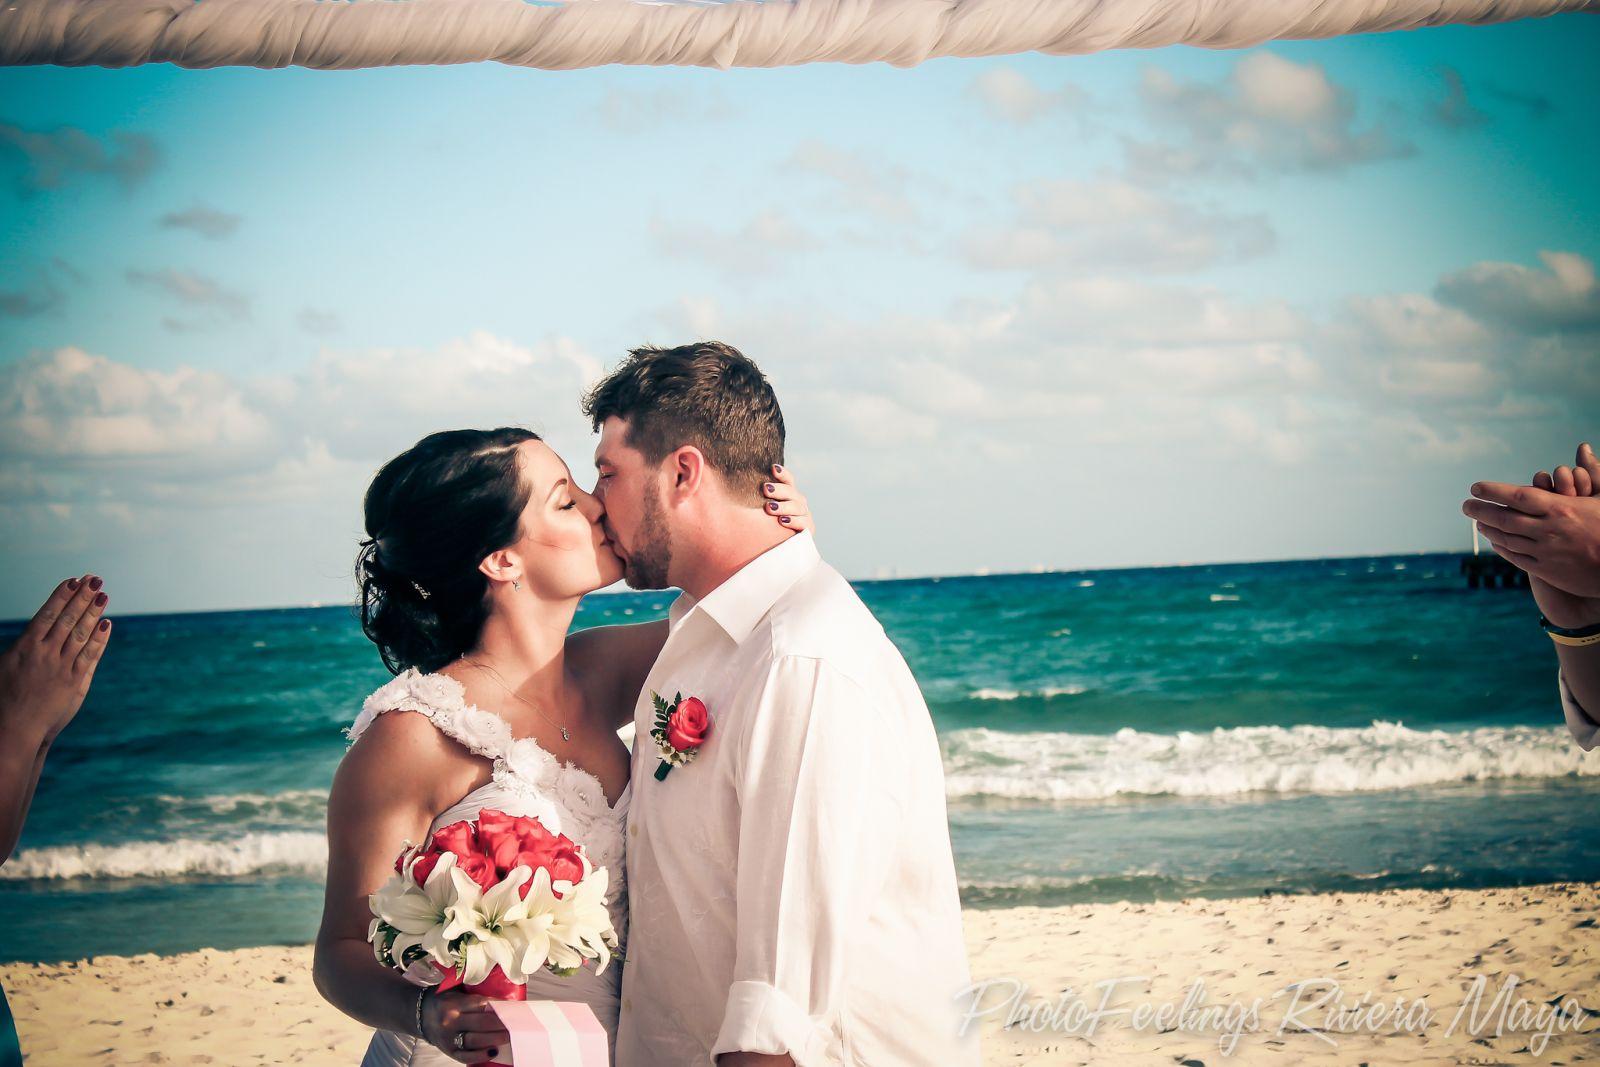 Nathen & Marie's Wedding